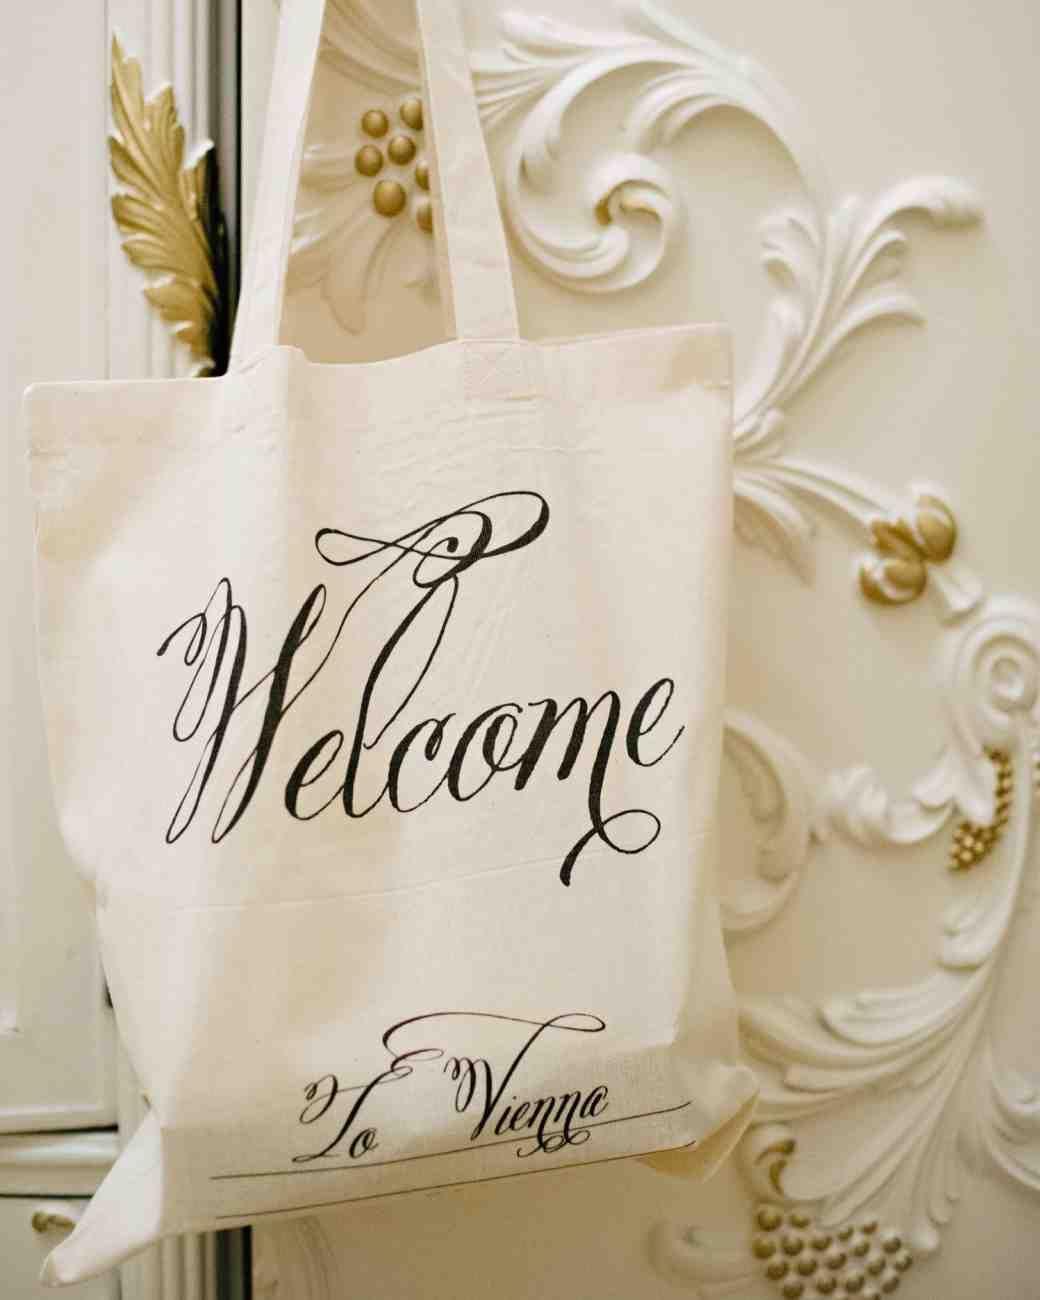 Gift Etiquette For Destination Weddings: A Formal Ballroom Destination Wedding In Vienna, Austria